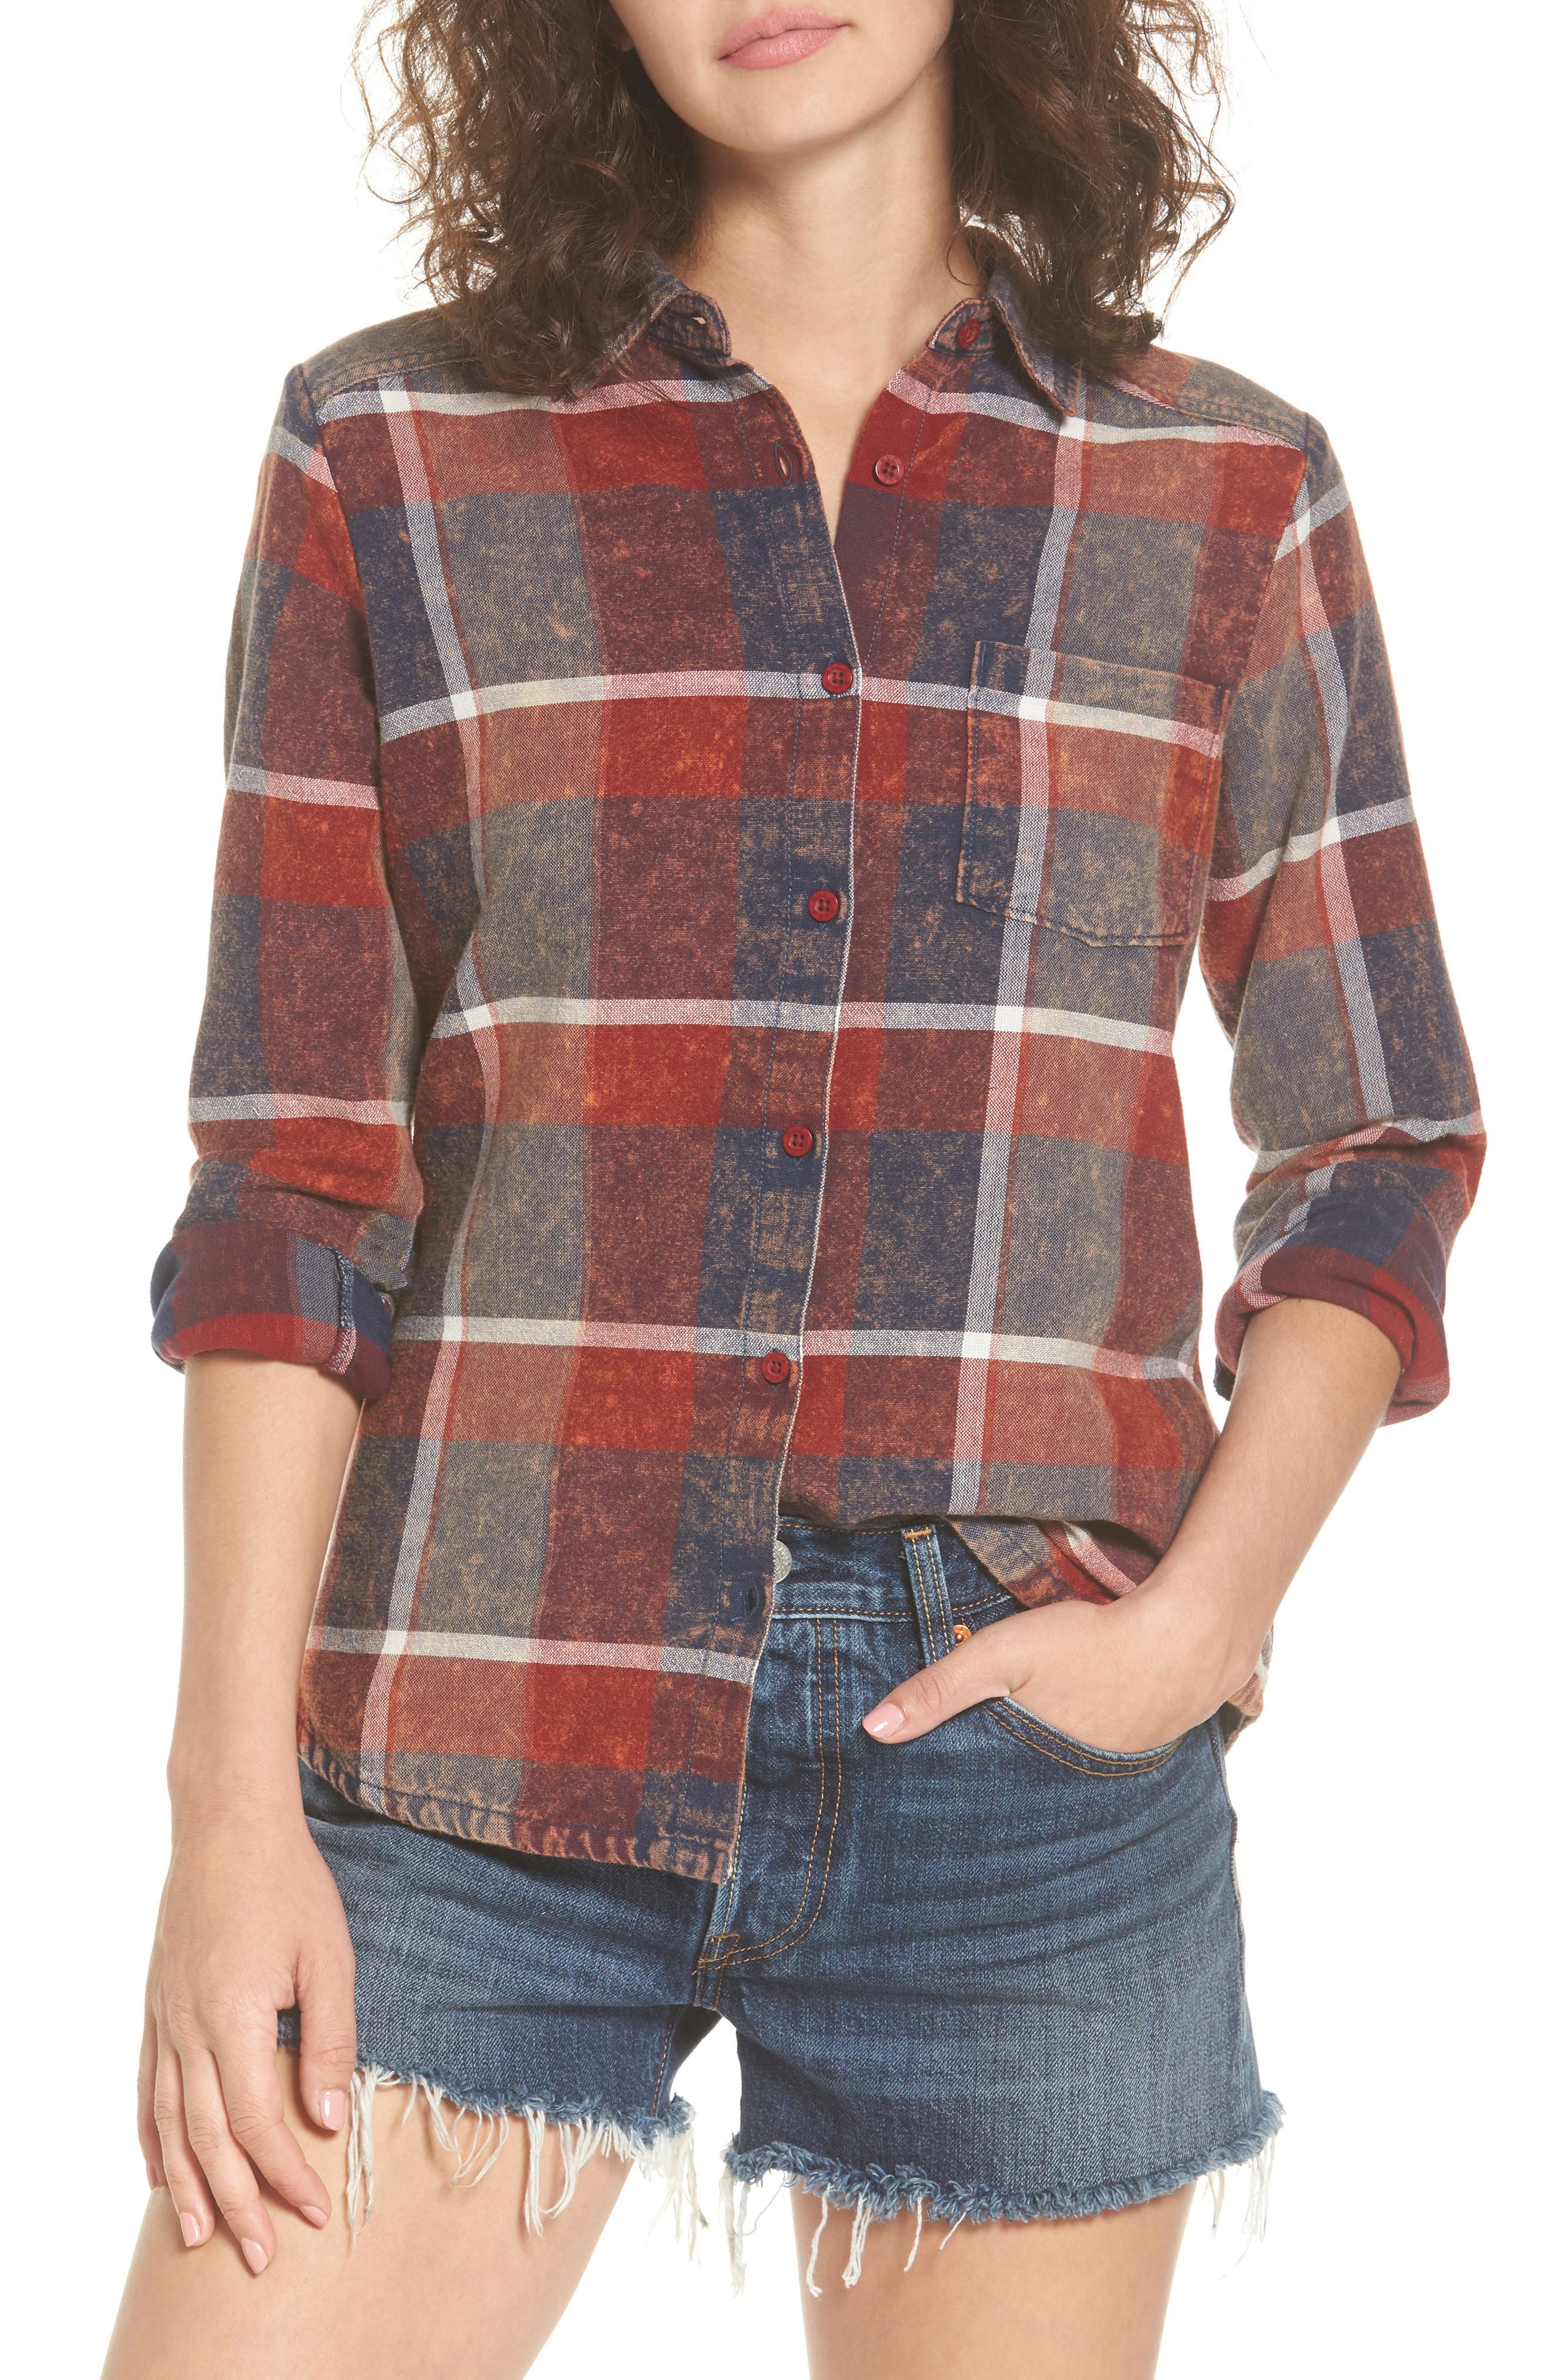 Main Image - RVCA Pops Cotton Plaid Shirt